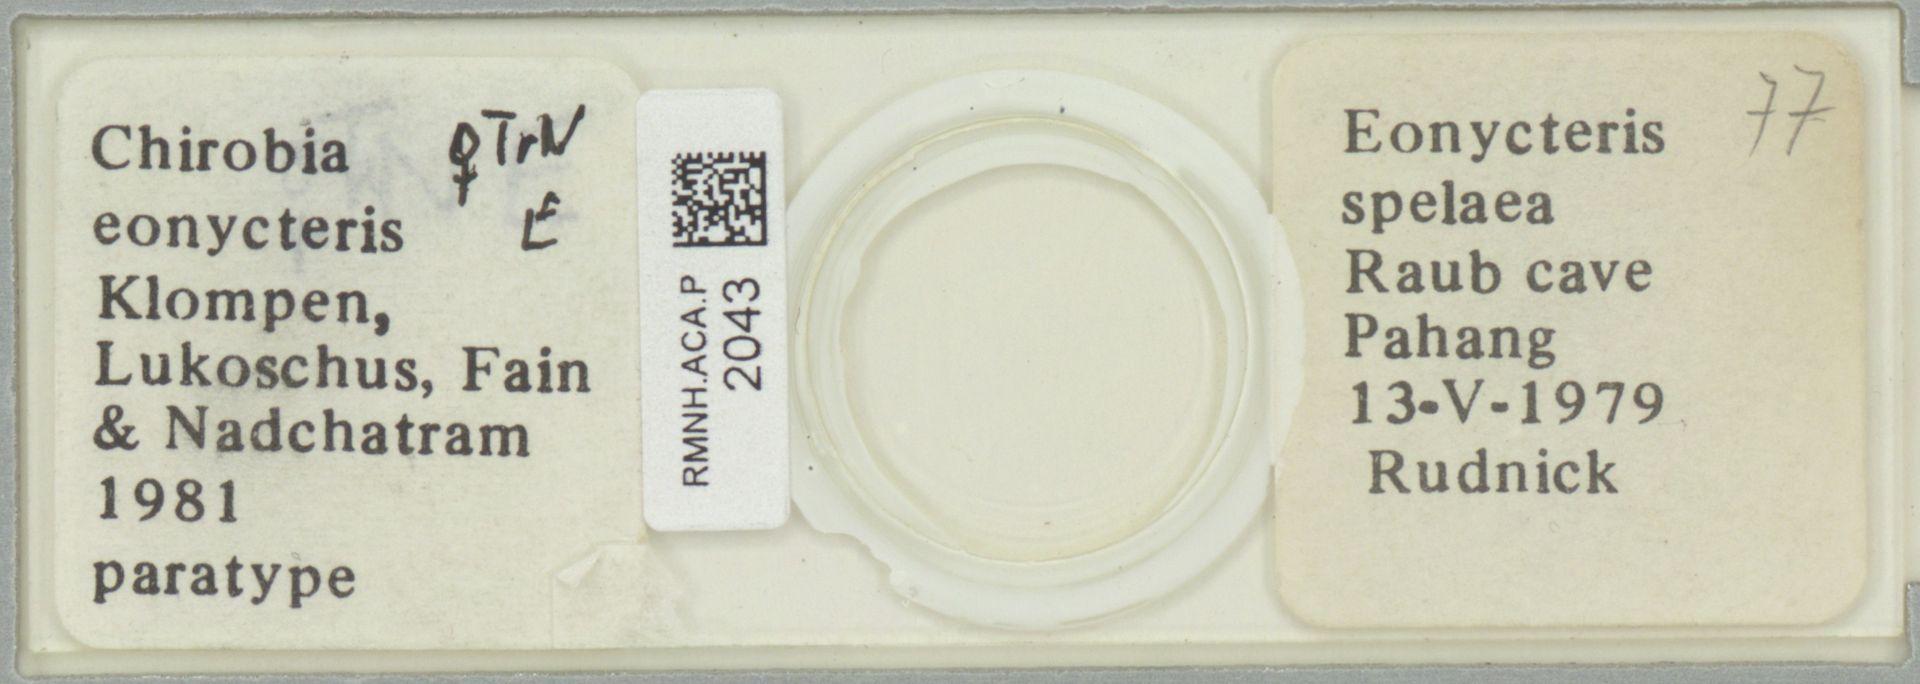 RMNH.ACA.P.2043   Chirobia eonycteris Klompen, Lukoschus & Nadchatram, 1981